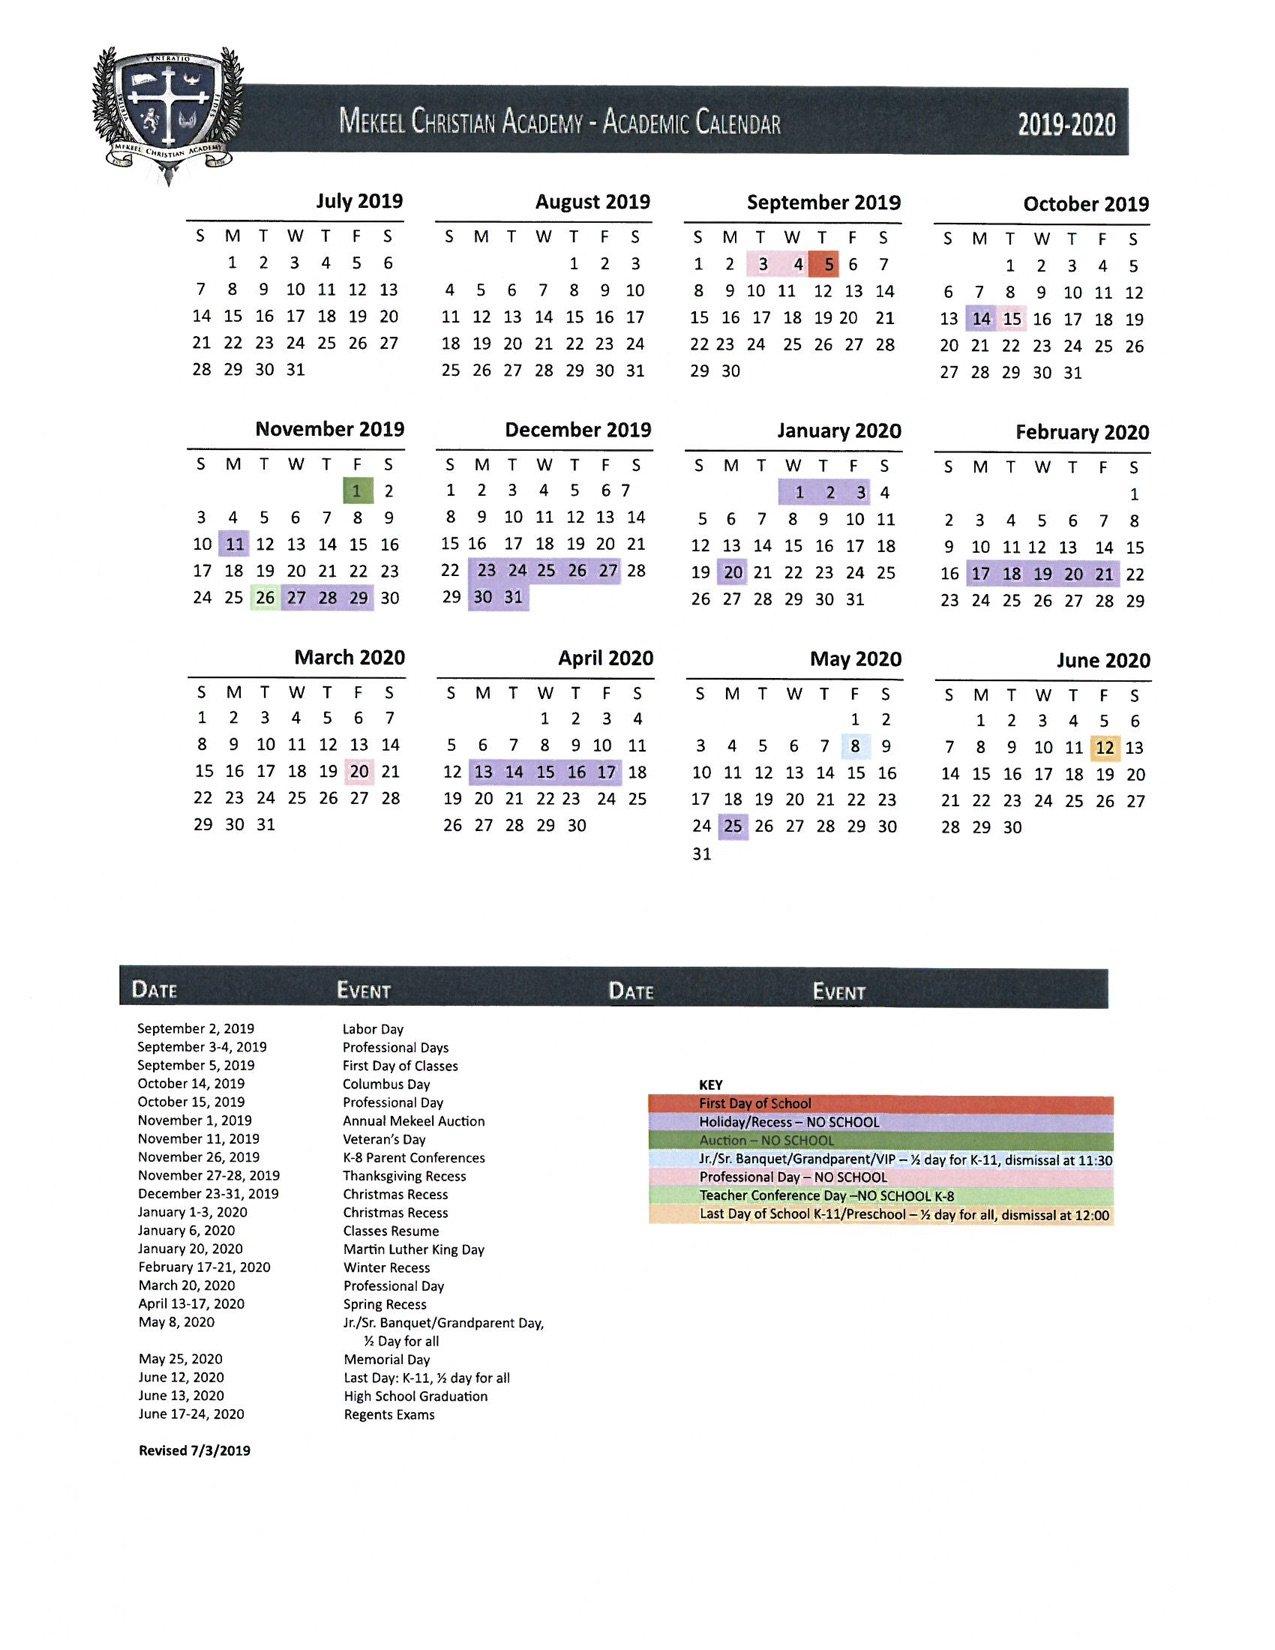 School Calendar York U Calendar 2019